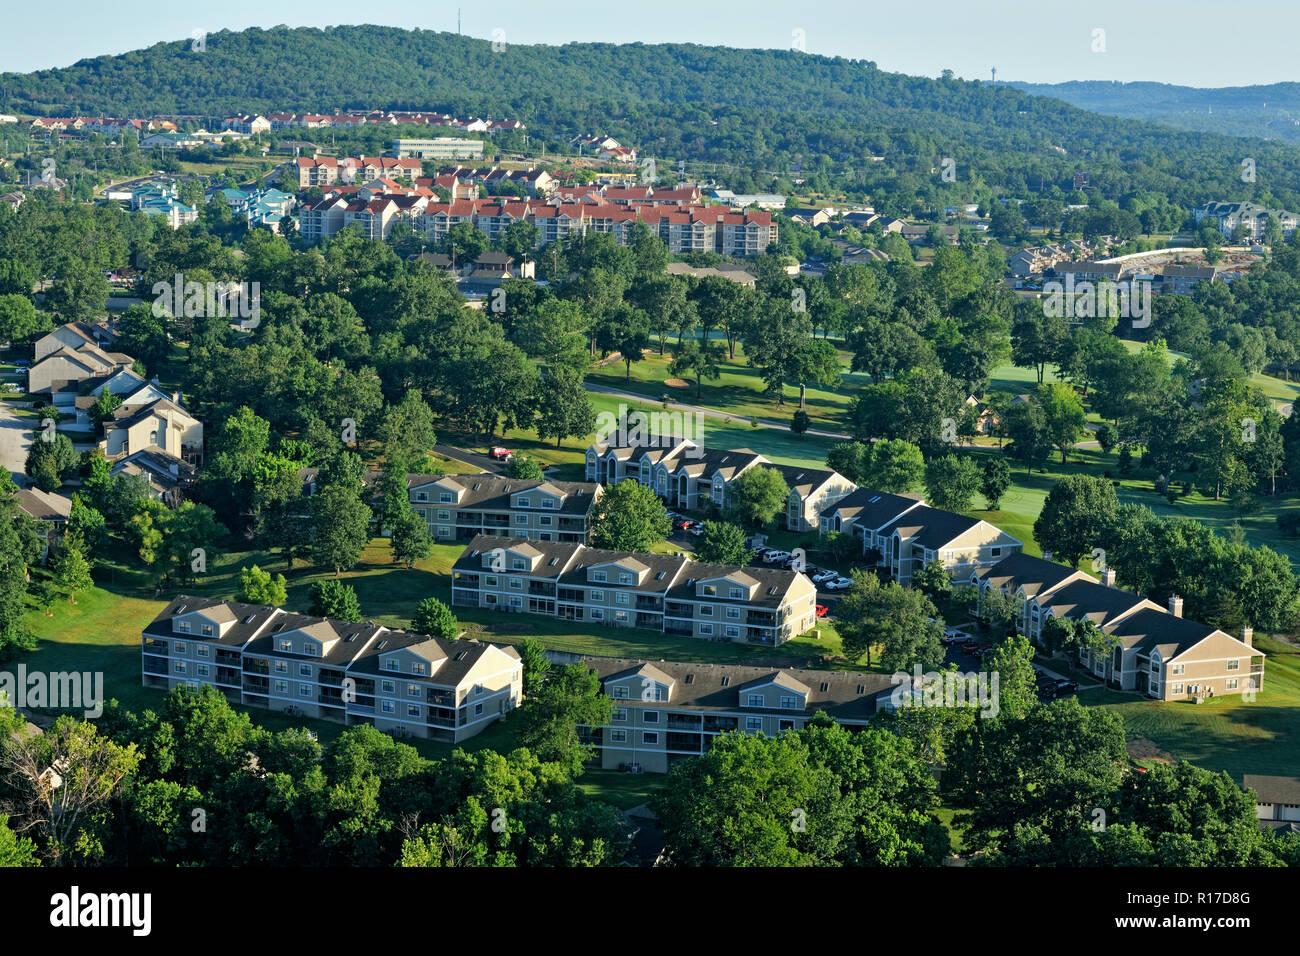 Suburban developments near Branson, Table Rock State Park, Branson, Missouri, USA - Stock Image